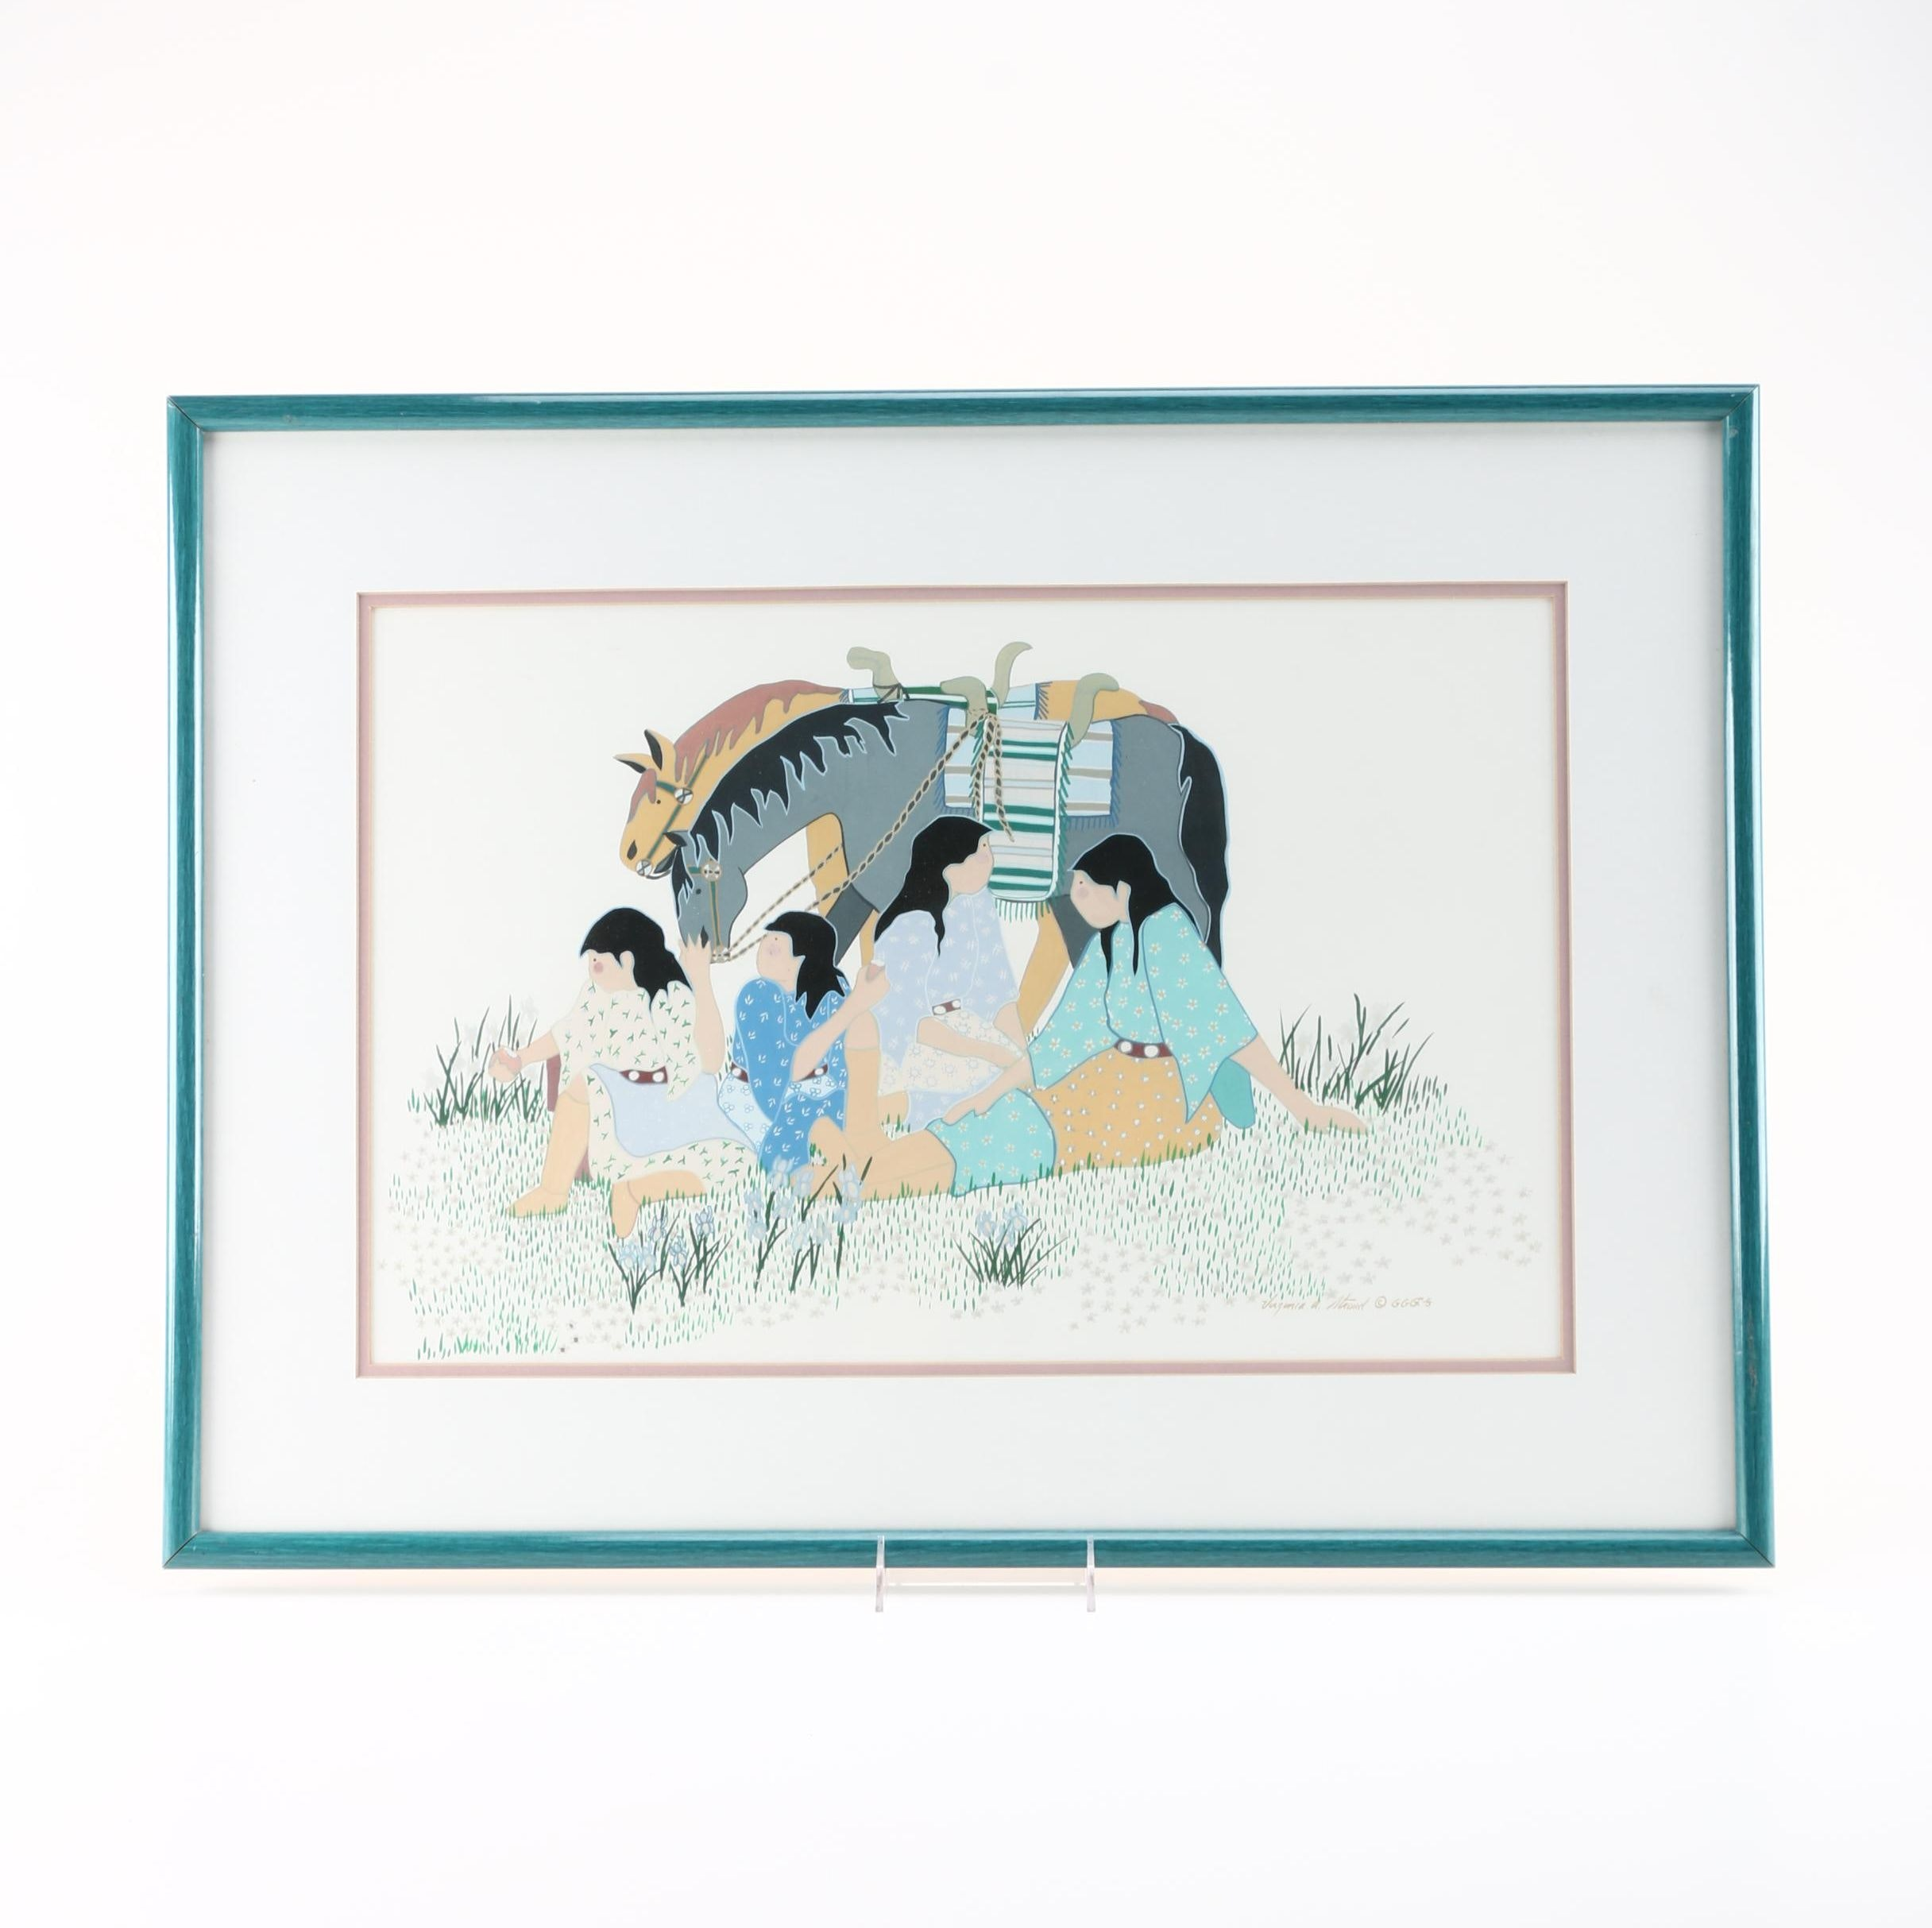 Virginia Stroud Gouache Painting on Paper of Native American Scene